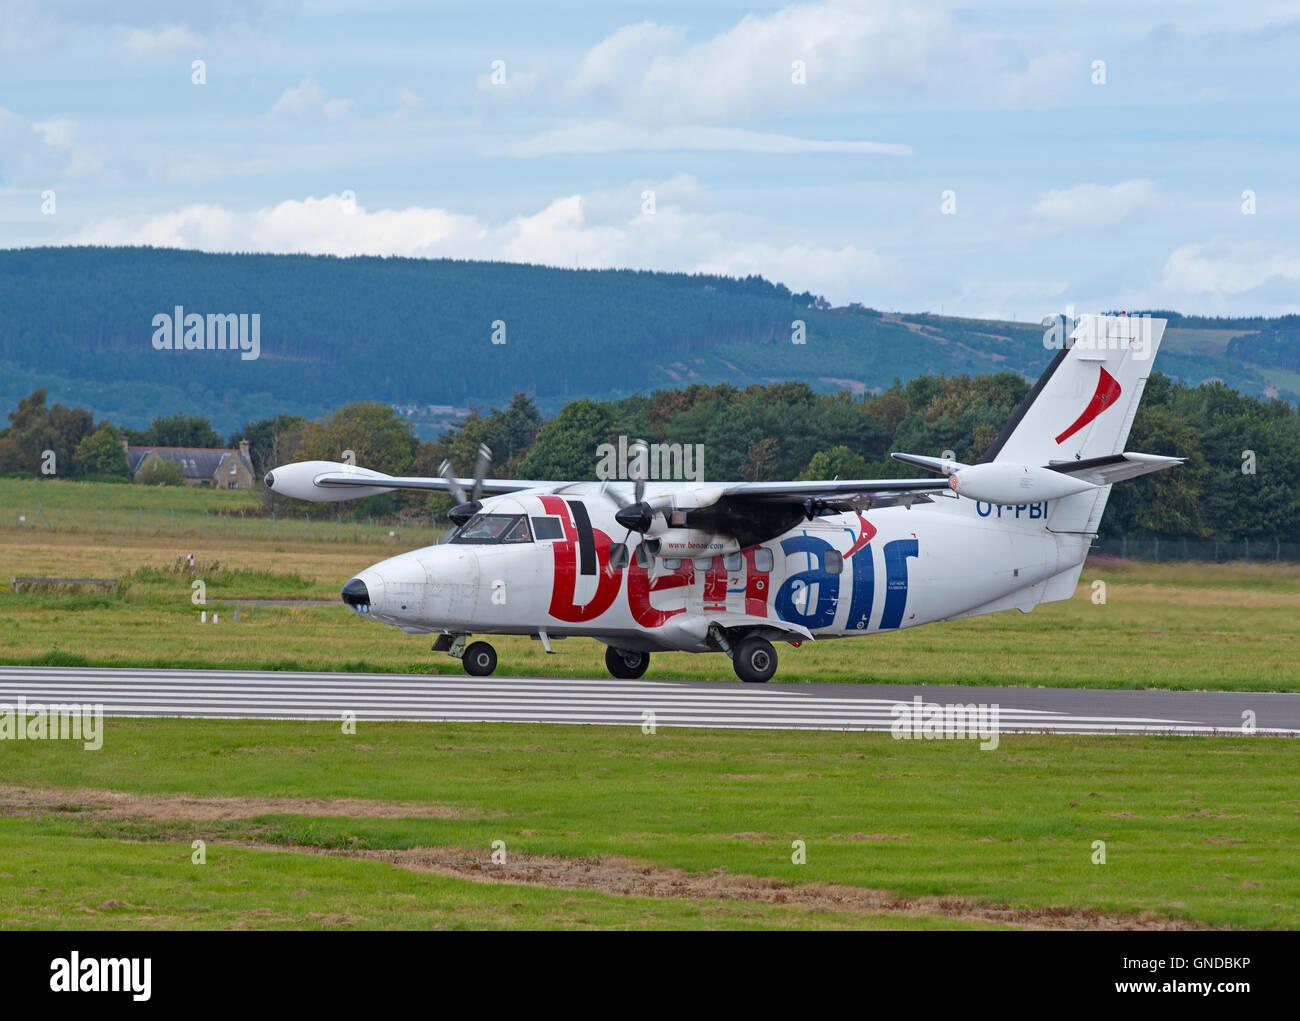 Danish registered Let L-410 UVP-E20 Turbojet Arriving at Inverness Airport Scotland.  SCO 11,213. - Stock Image